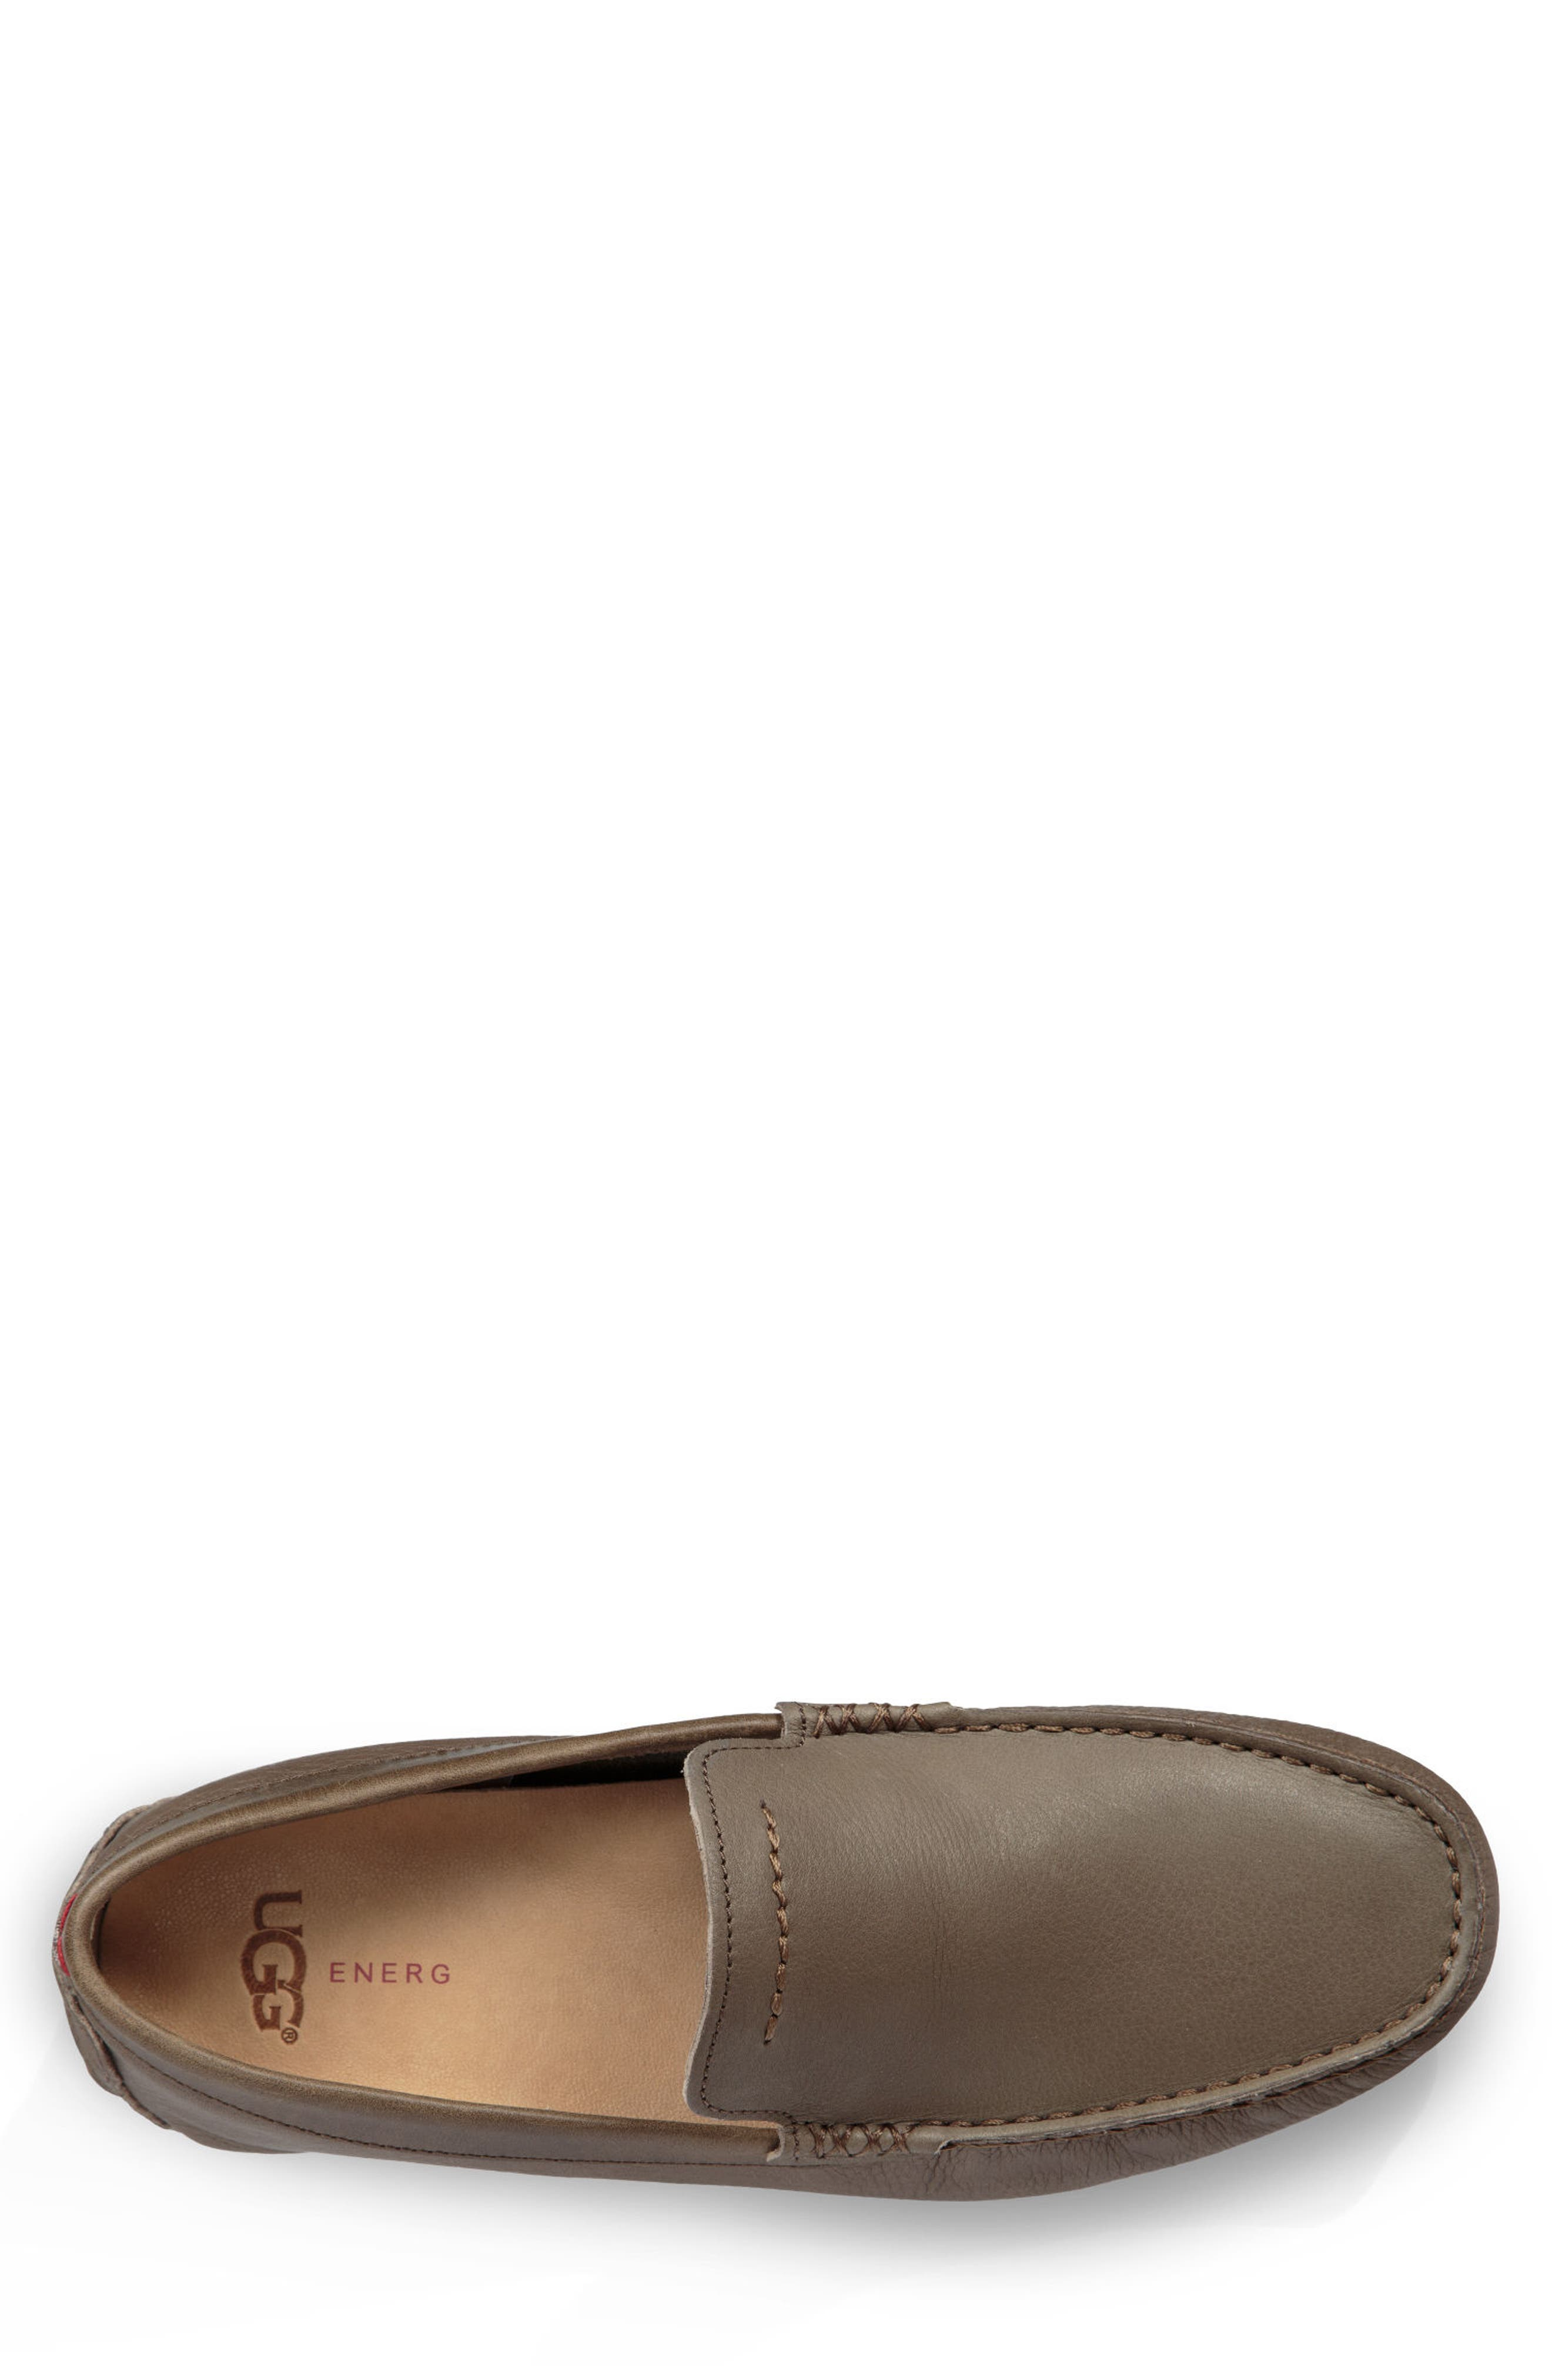 UGG<SUP>®</SUP>, 'Henrick' Driving Shoe, Alternate thumbnail 4, color, TAUPE